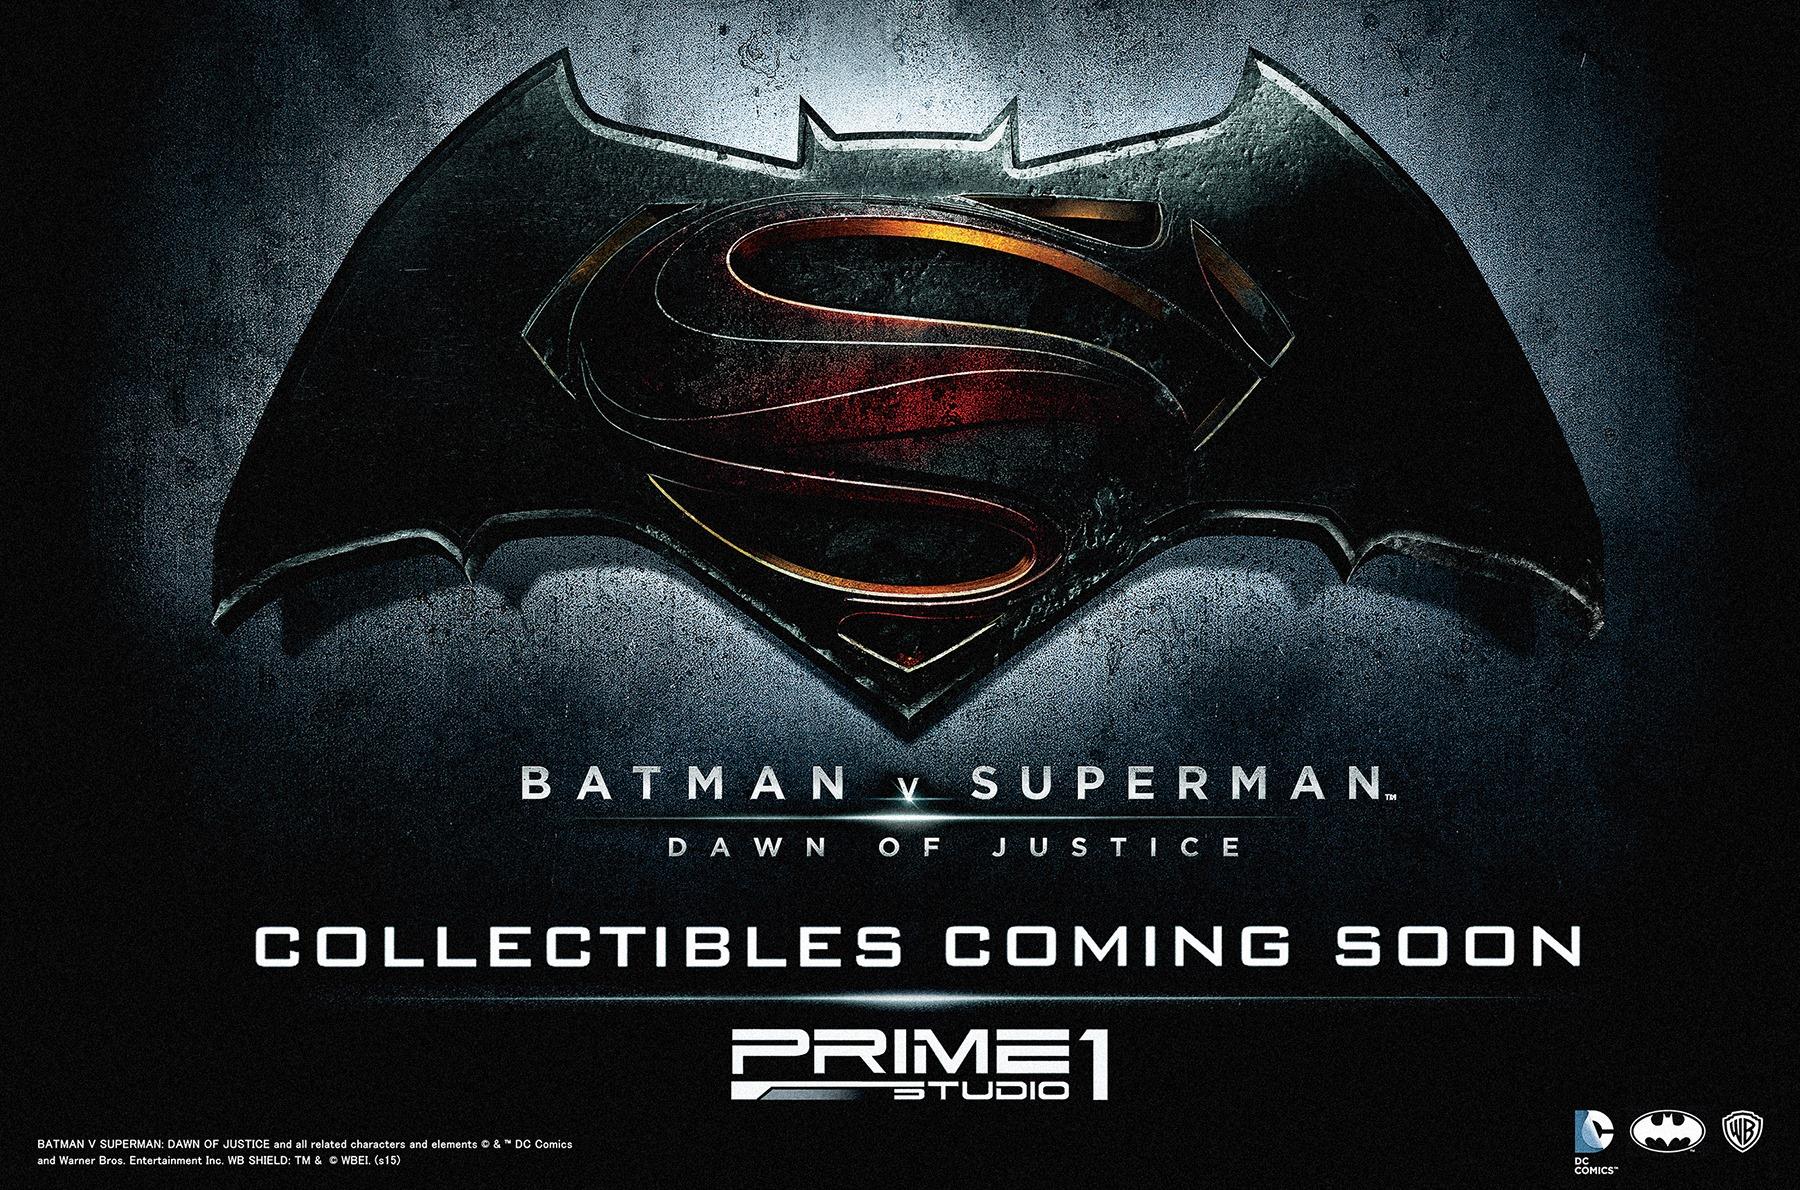 Prime Studio 将推出蝙蝠侠大战超人 正义黎明 系列雕像 玩家社区 专业的兵人模型论坛